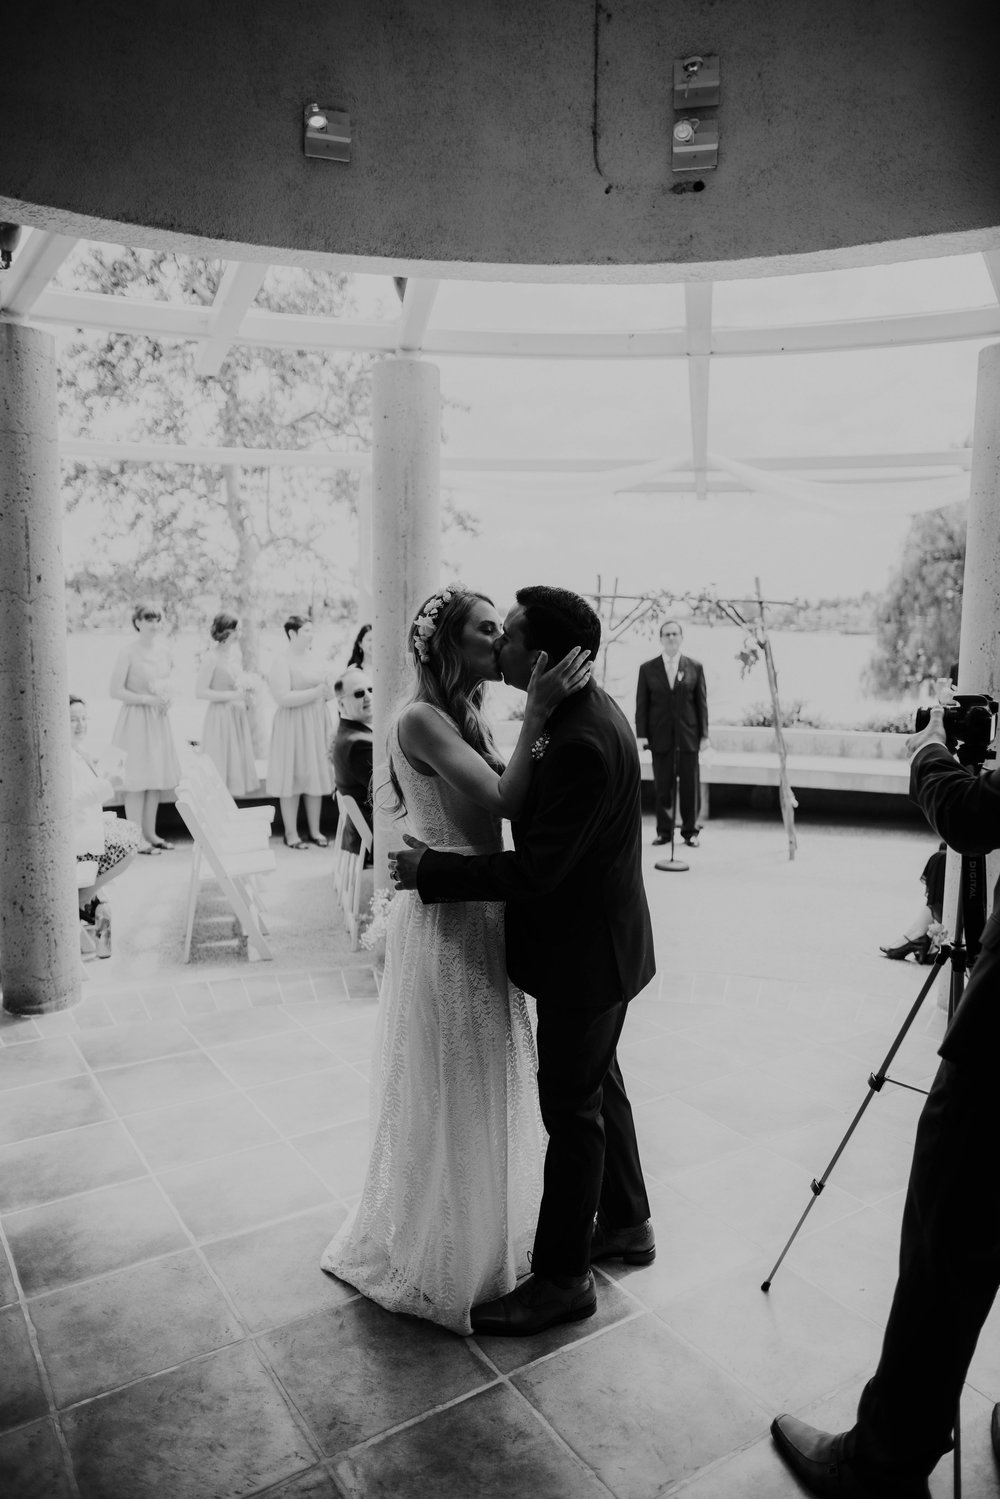 Lake mission viejo wedding socal wedding photographer grace e jones intimate romantic joy filled wedding photography56.jpg